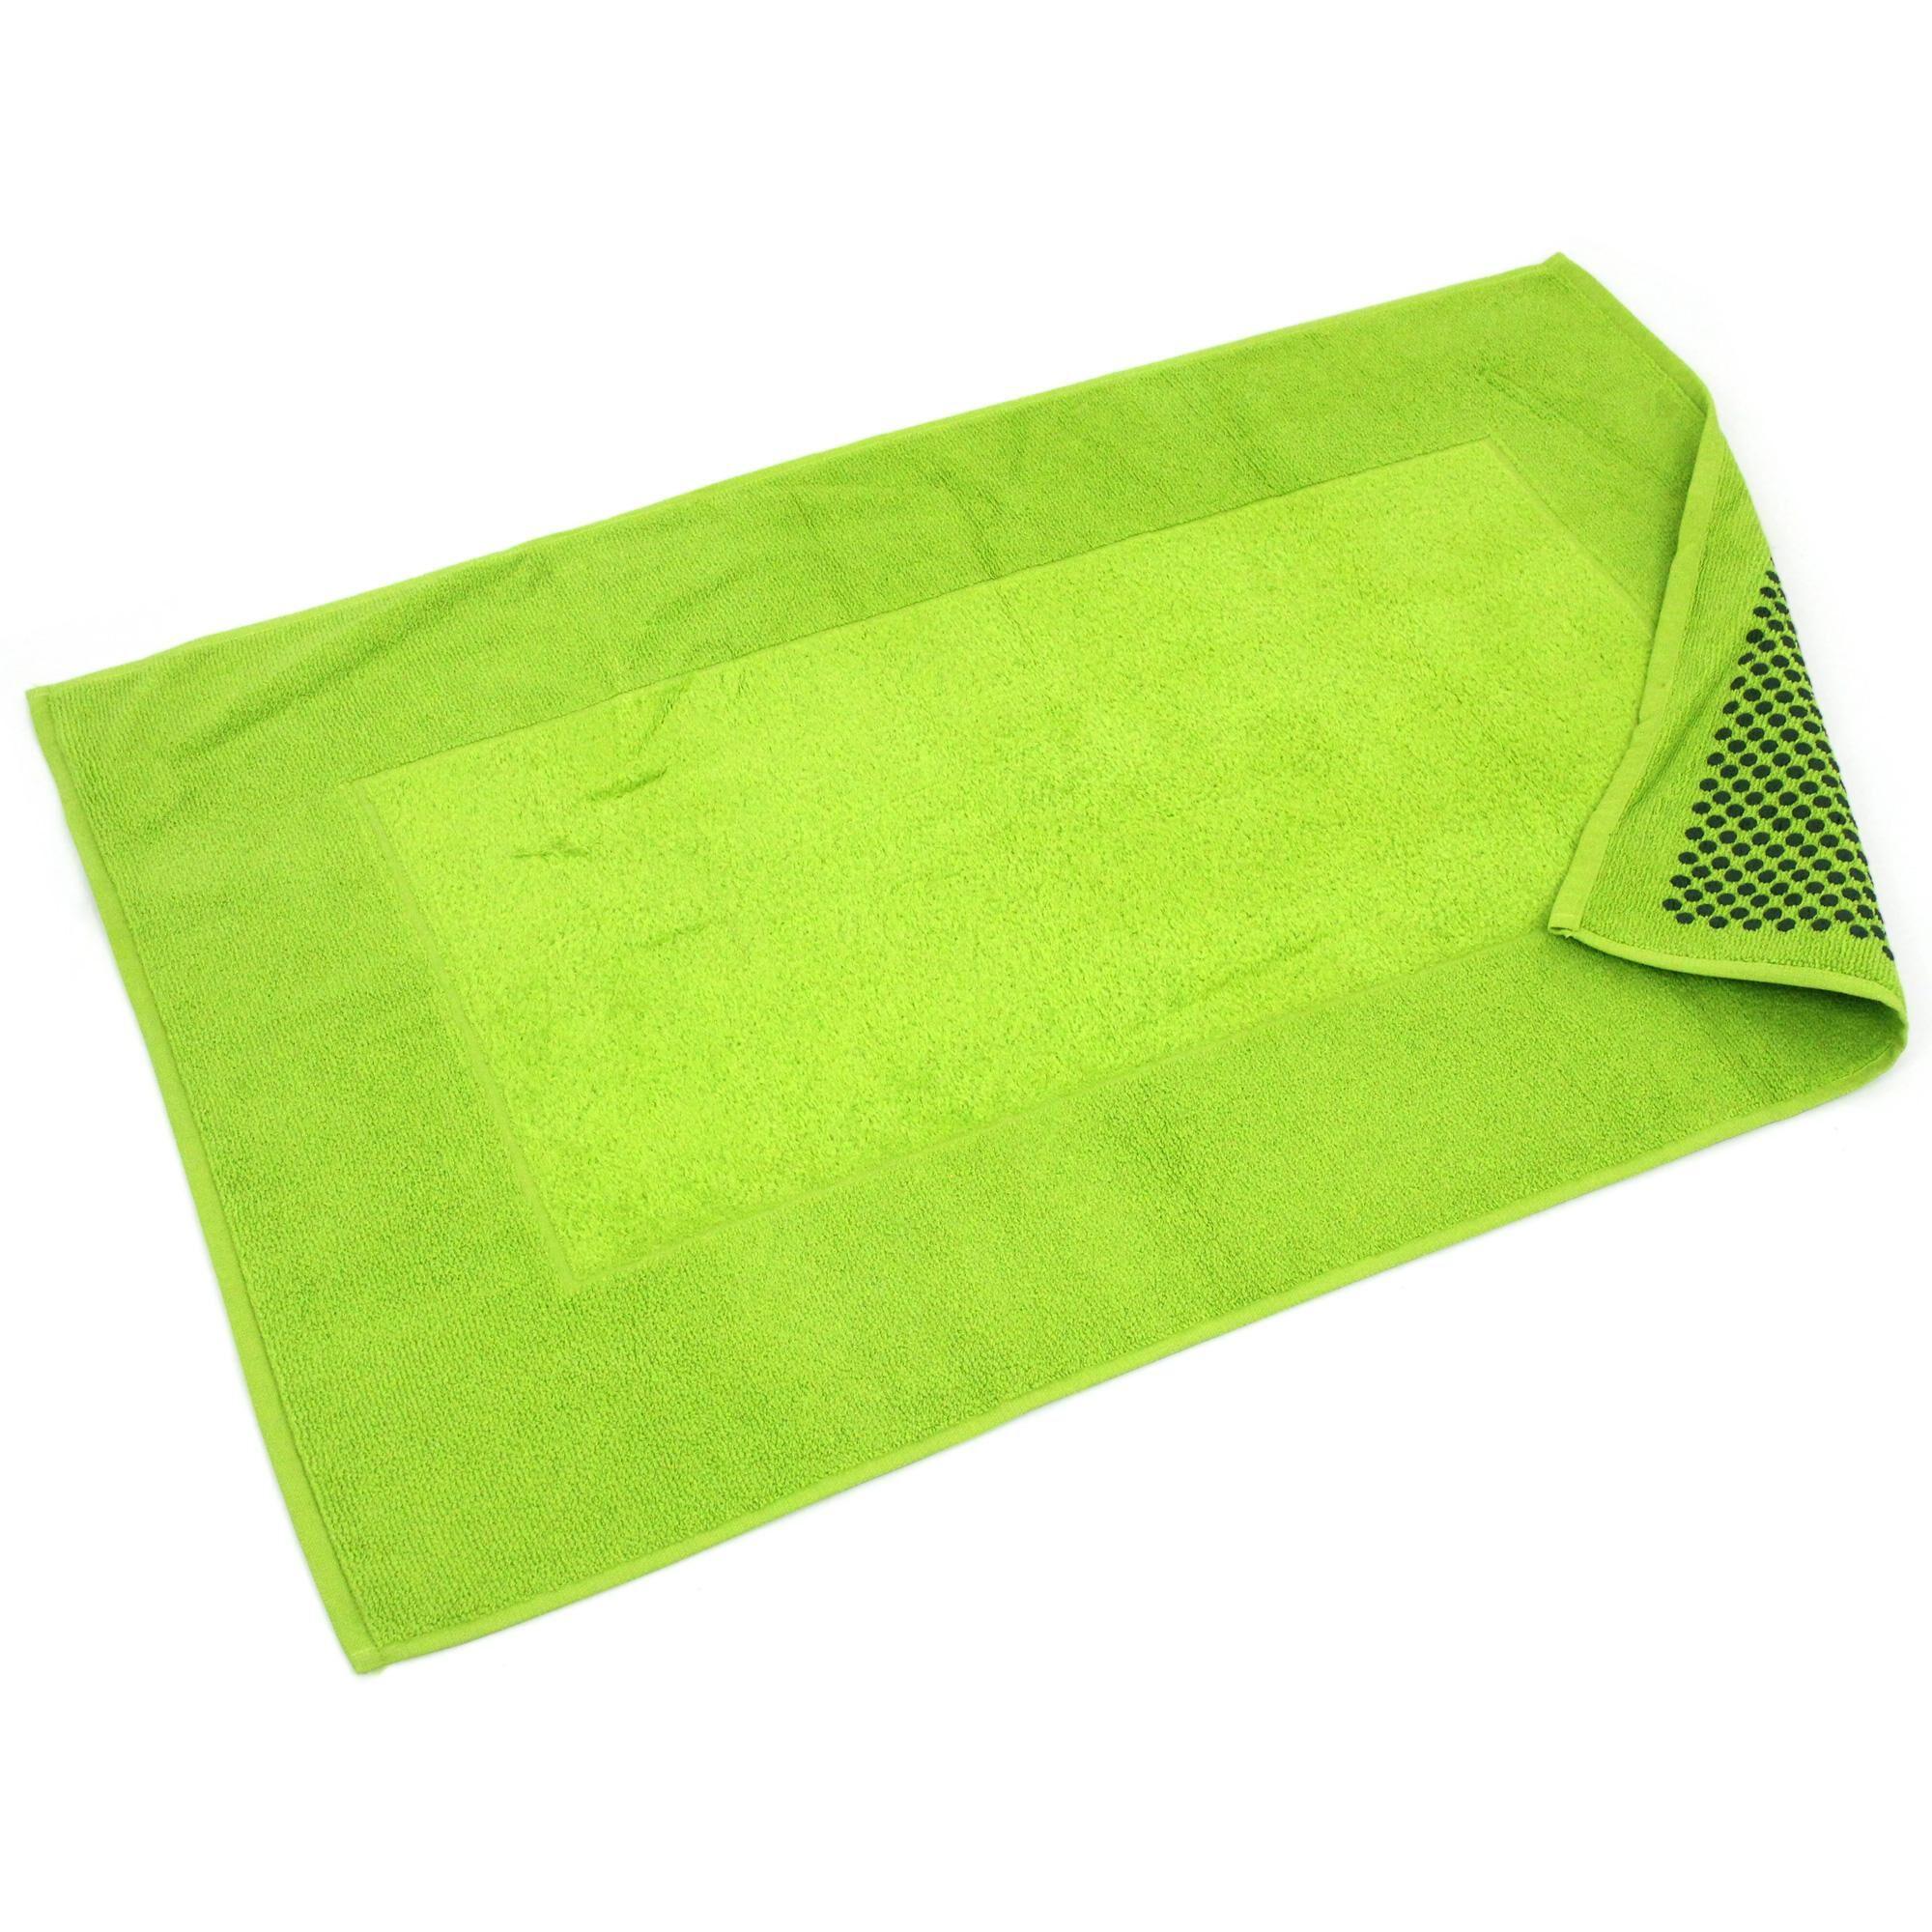 Linnea Tapis de bain antidérapant 60x90 cm velours PRESTIGE vert Pistache